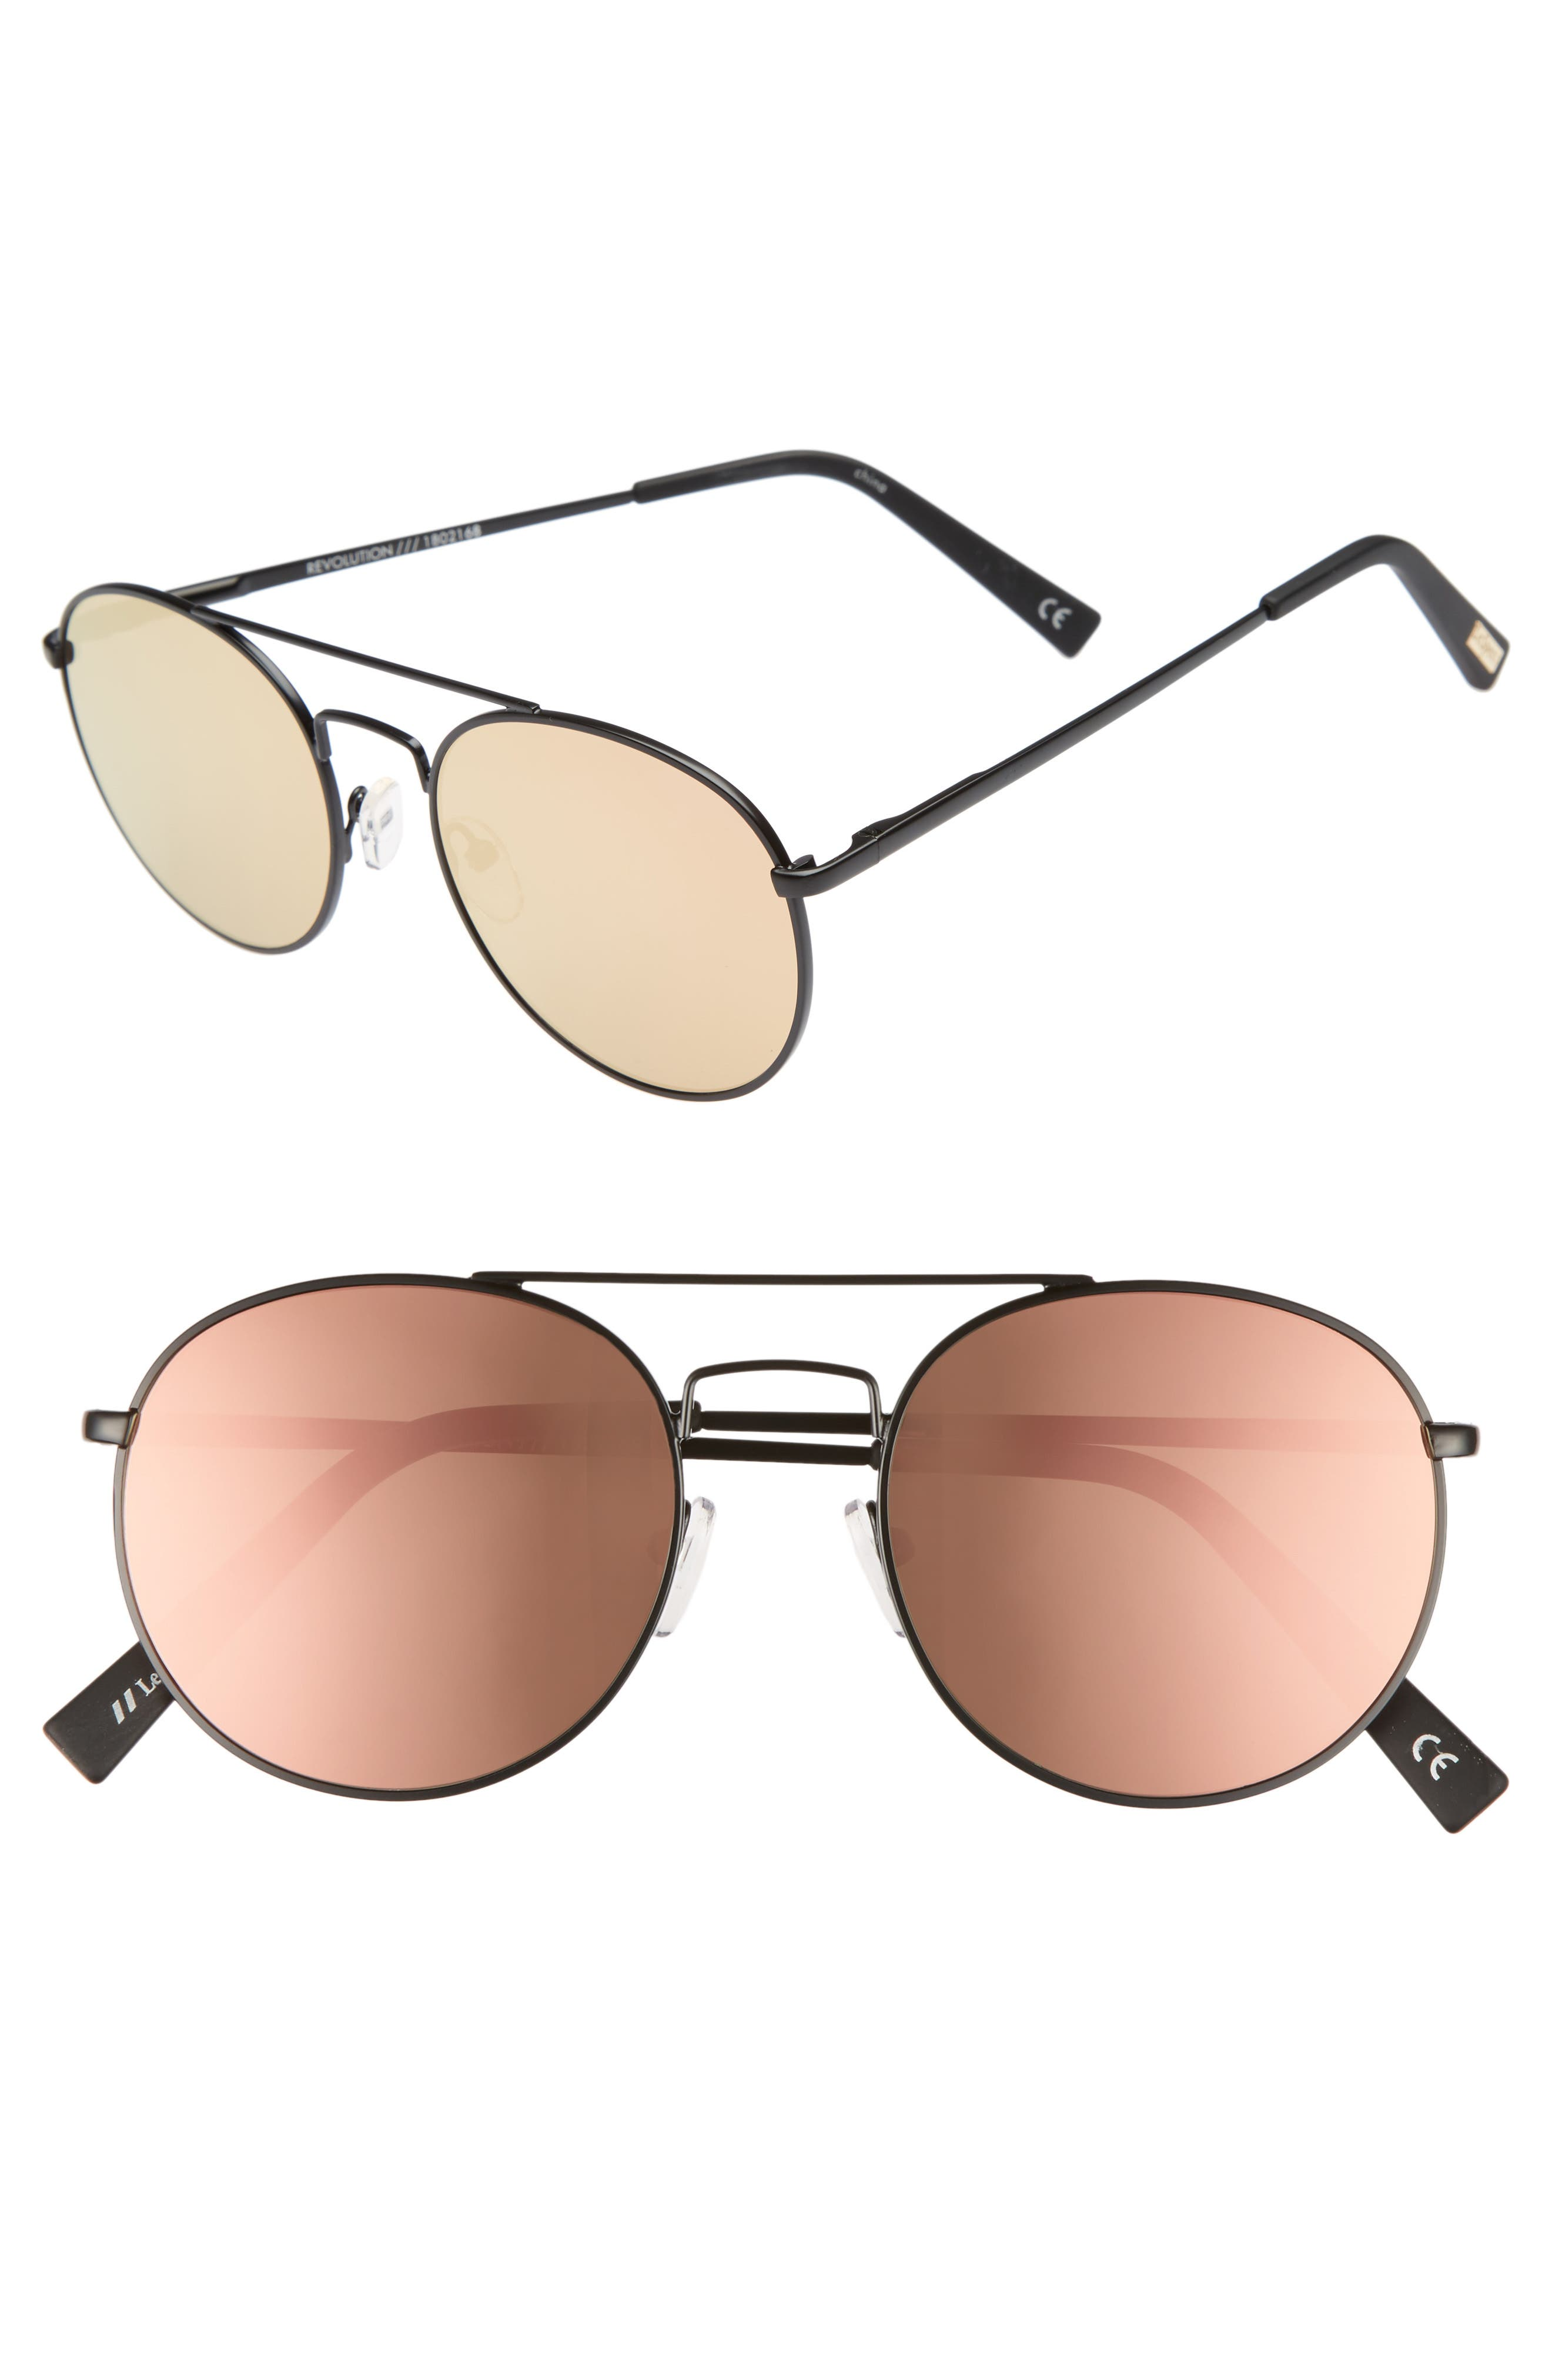 Revolution 53mm Aviator Sunglasses,                             Main thumbnail 1, color,                             MATTE BLACK